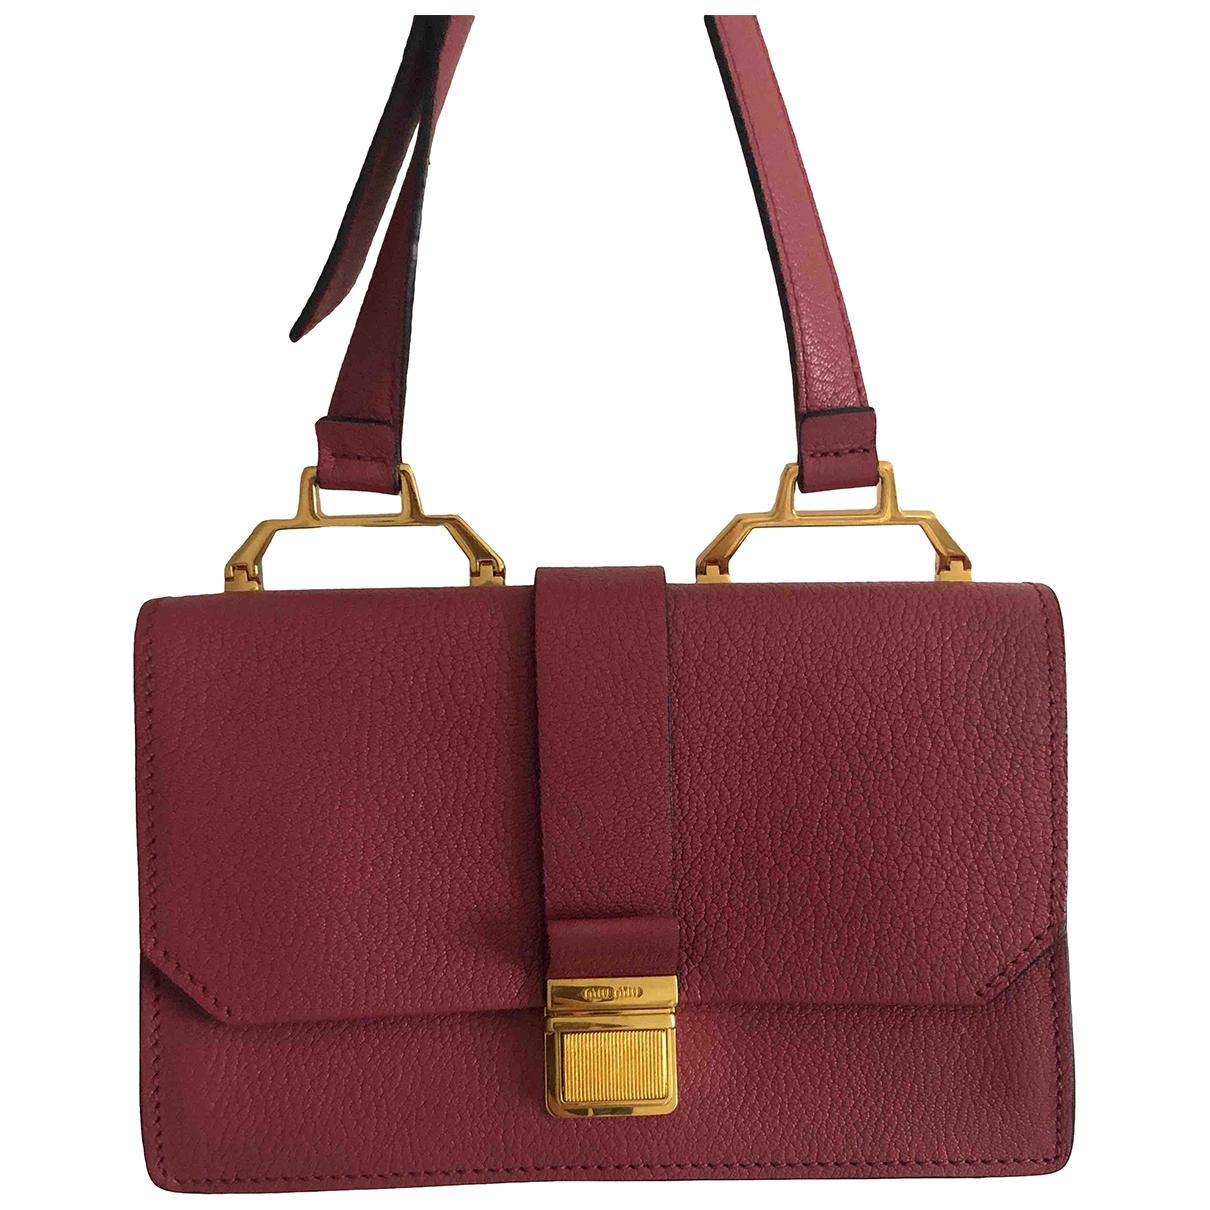 Miu Miu \N Pink Leather handbag for Women \N